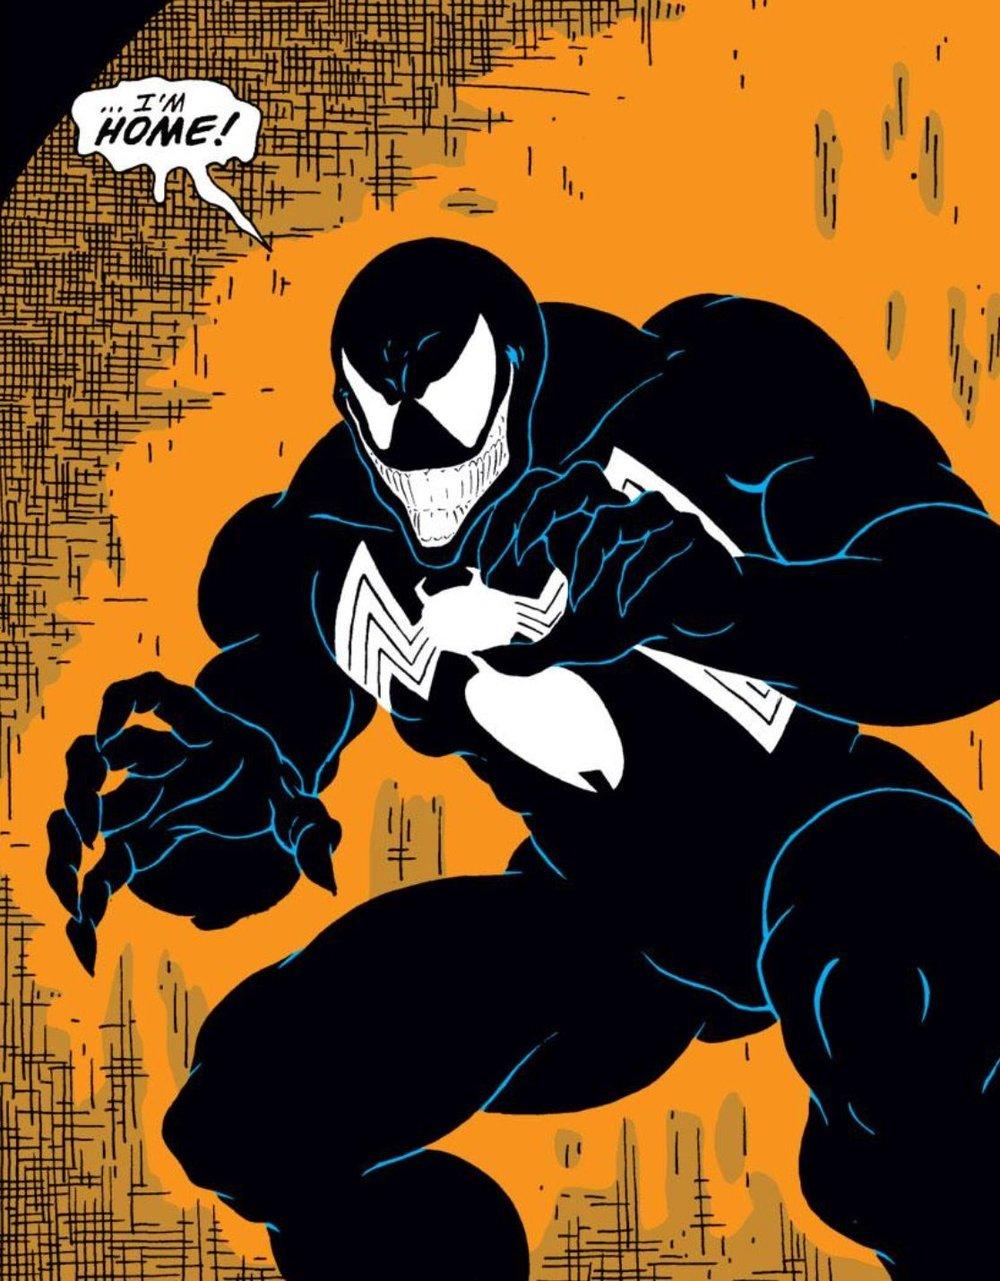 Fig. 2 - The Venom symbiote.